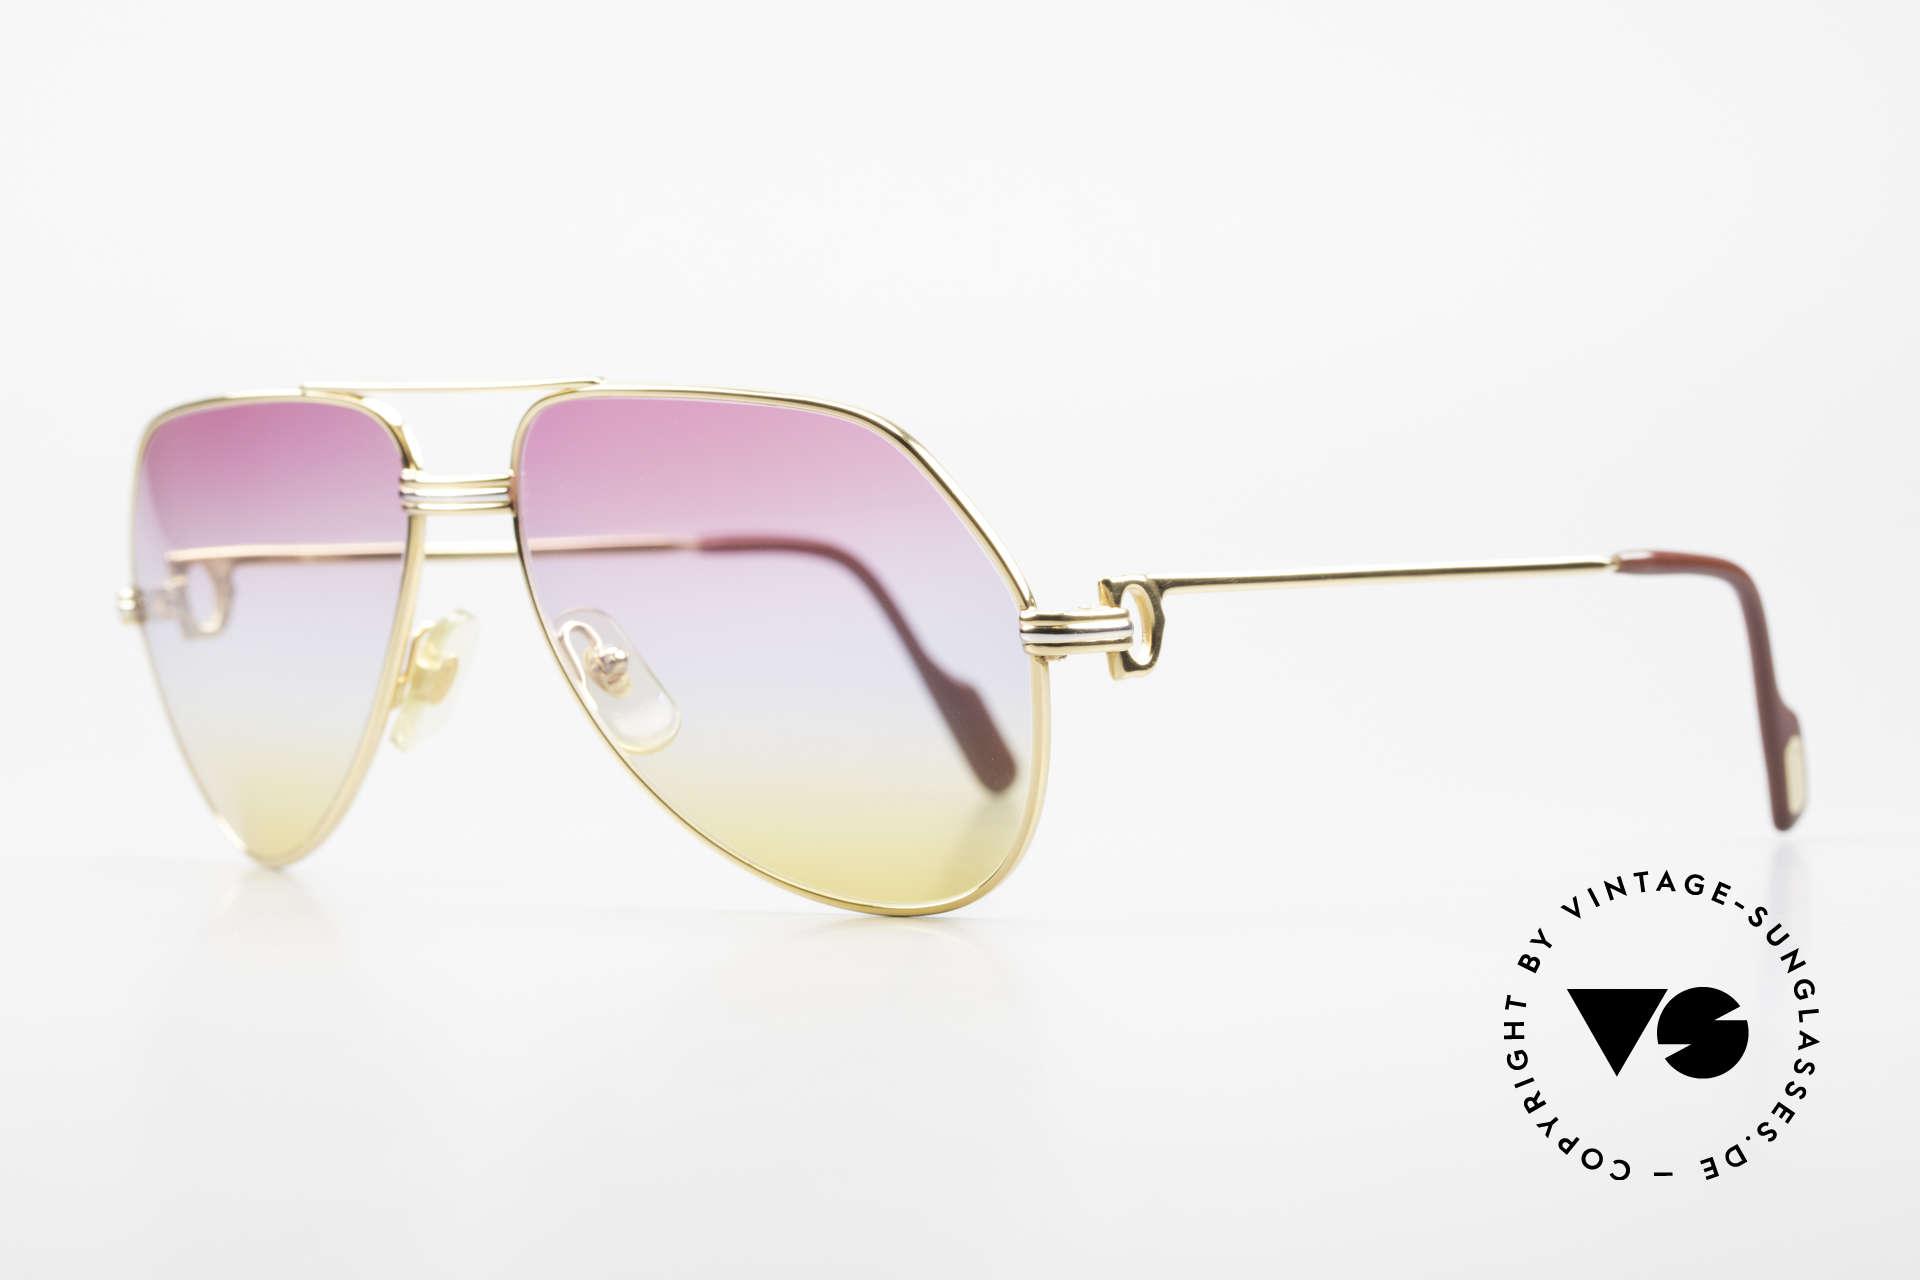 Cartier Vendome LC - M 80's 90's Aviator Sunglasses, here, Louis Cartier (LC) decor: medium size 59-16, 140, Made for Men and Women